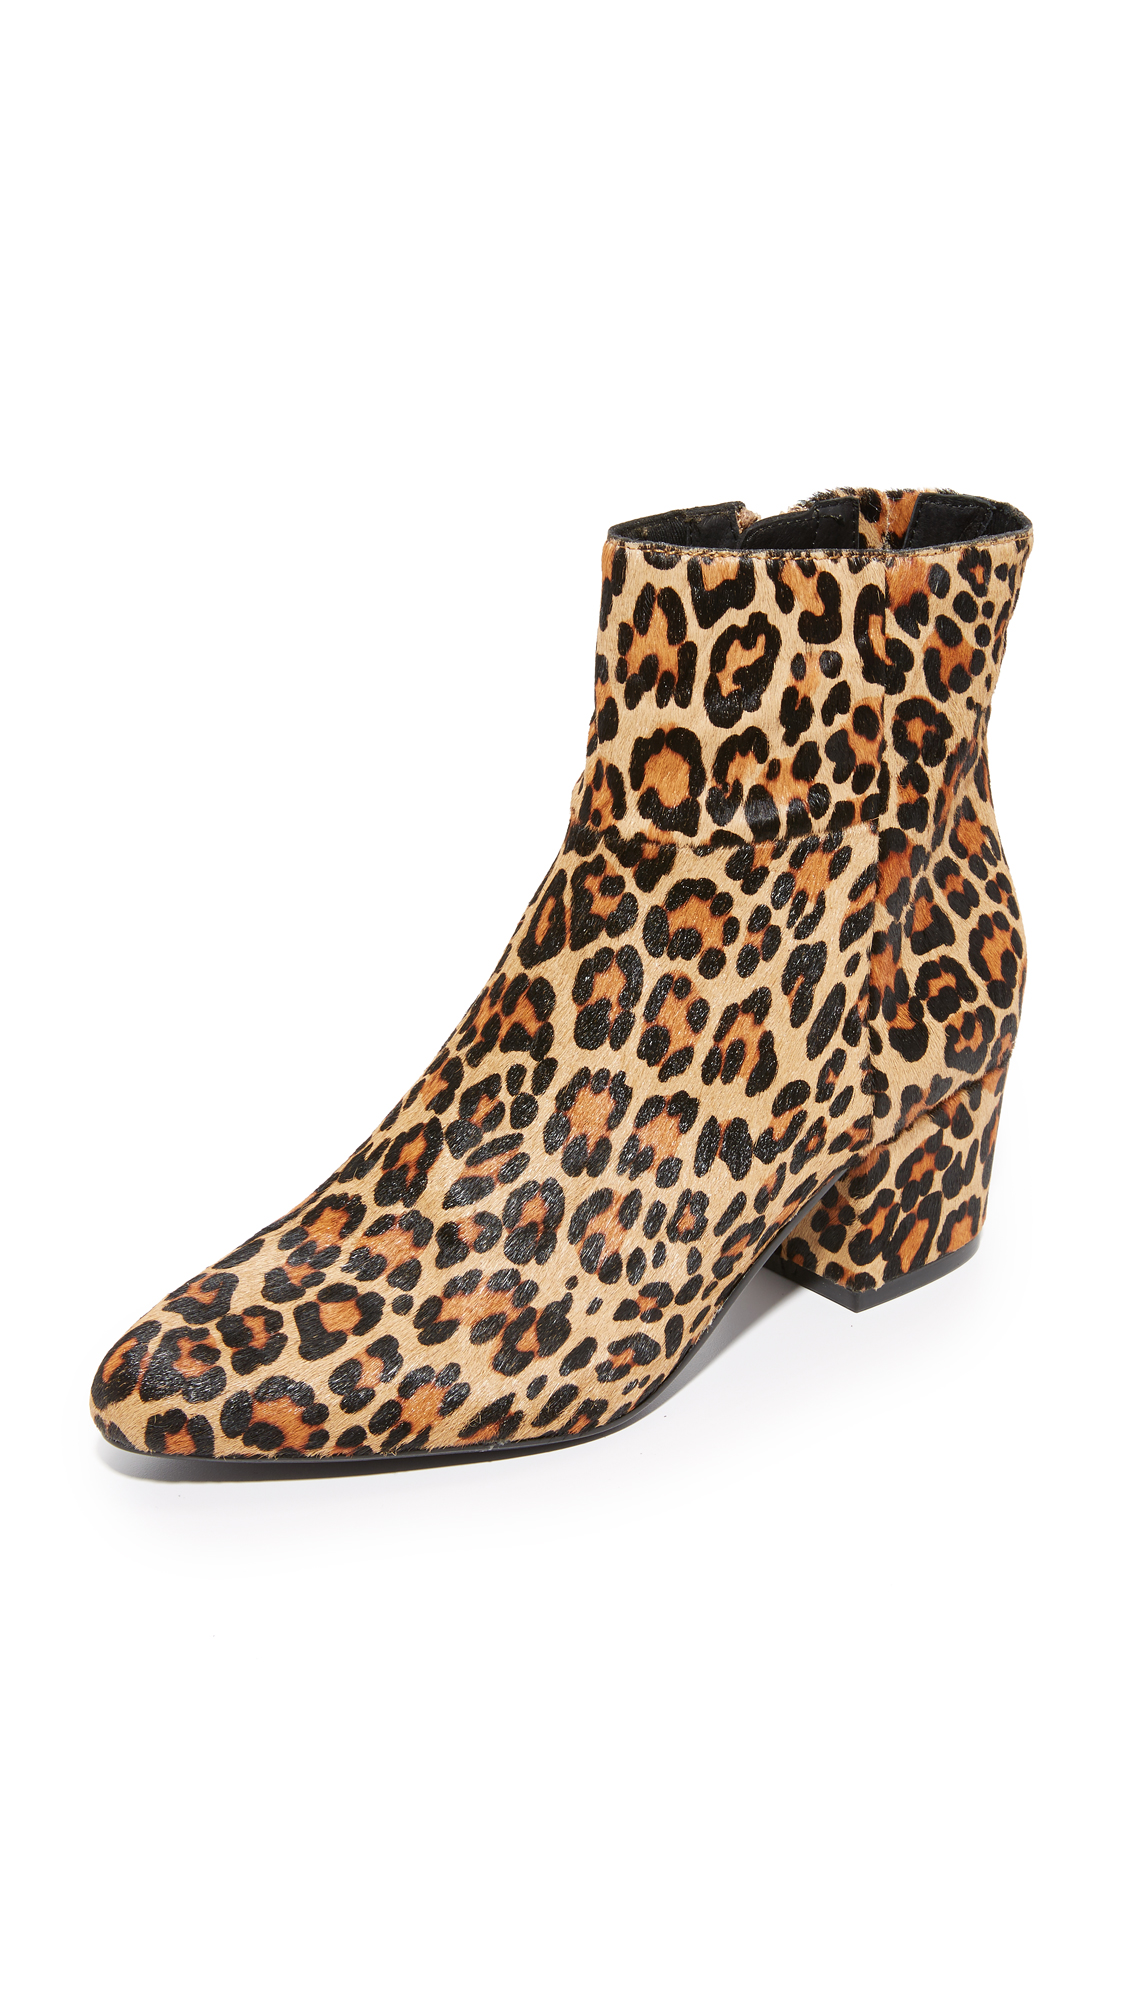 Steven Wes Haircalf Booties - Leopard